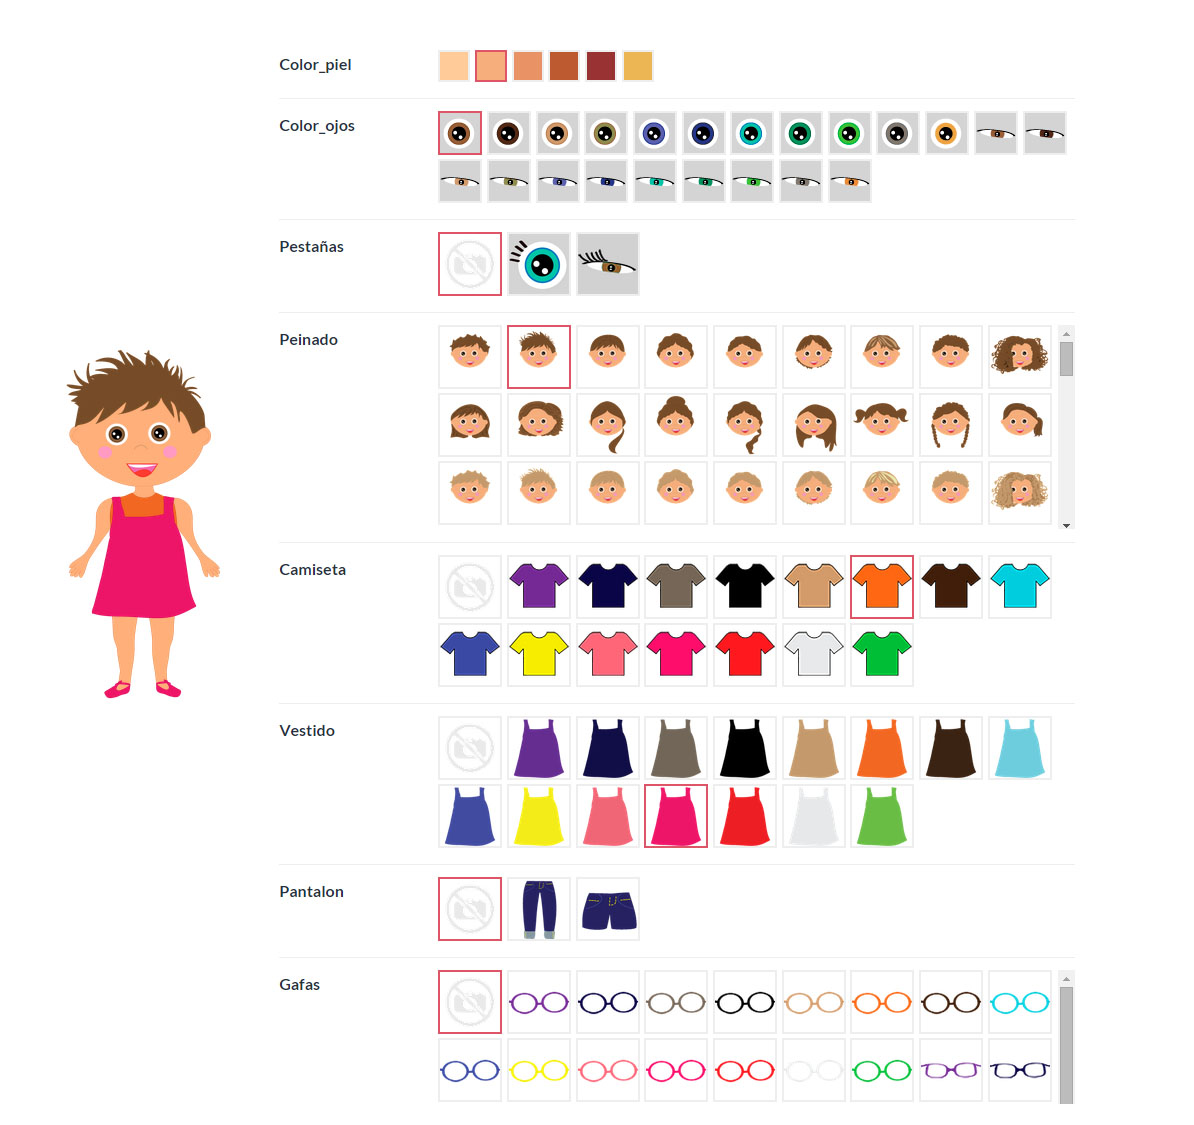 cuentos personalizados infantiles - configurador Ludobooks